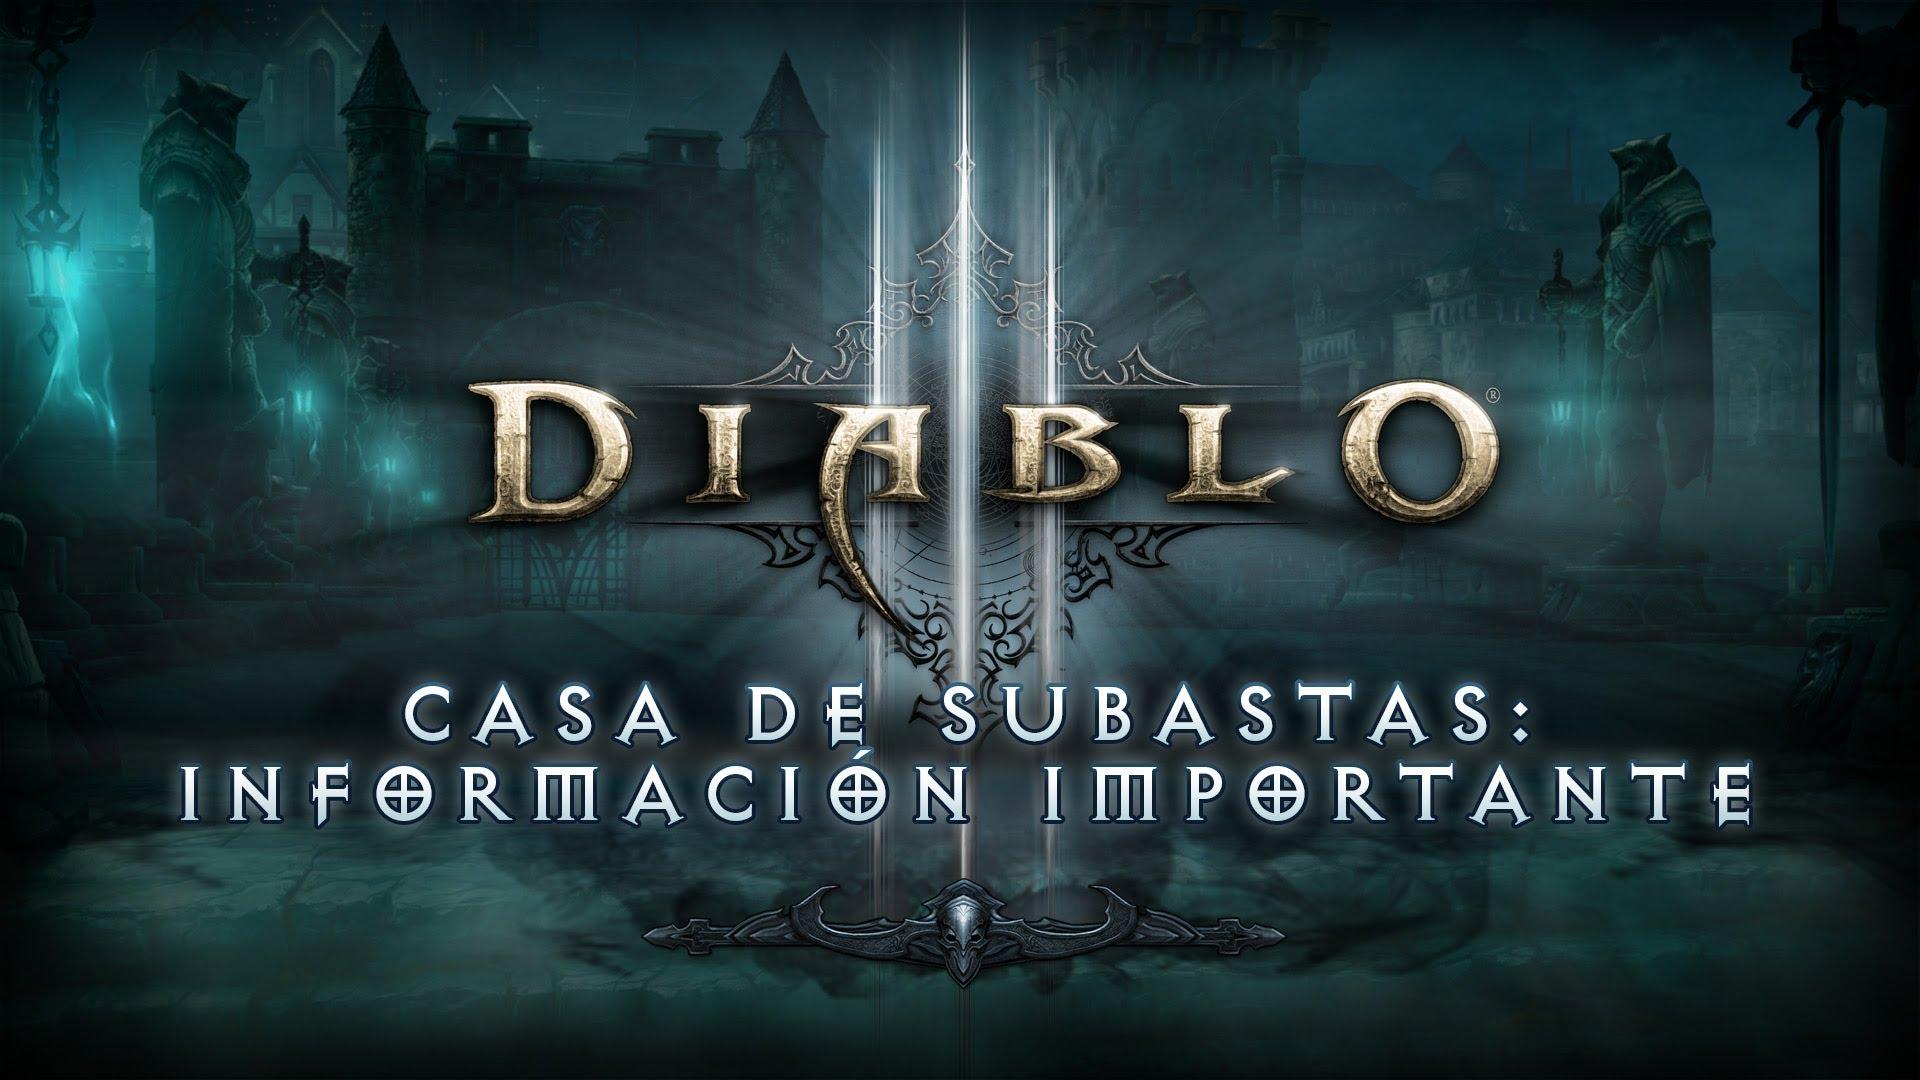 Diablo 3 casa de subastas